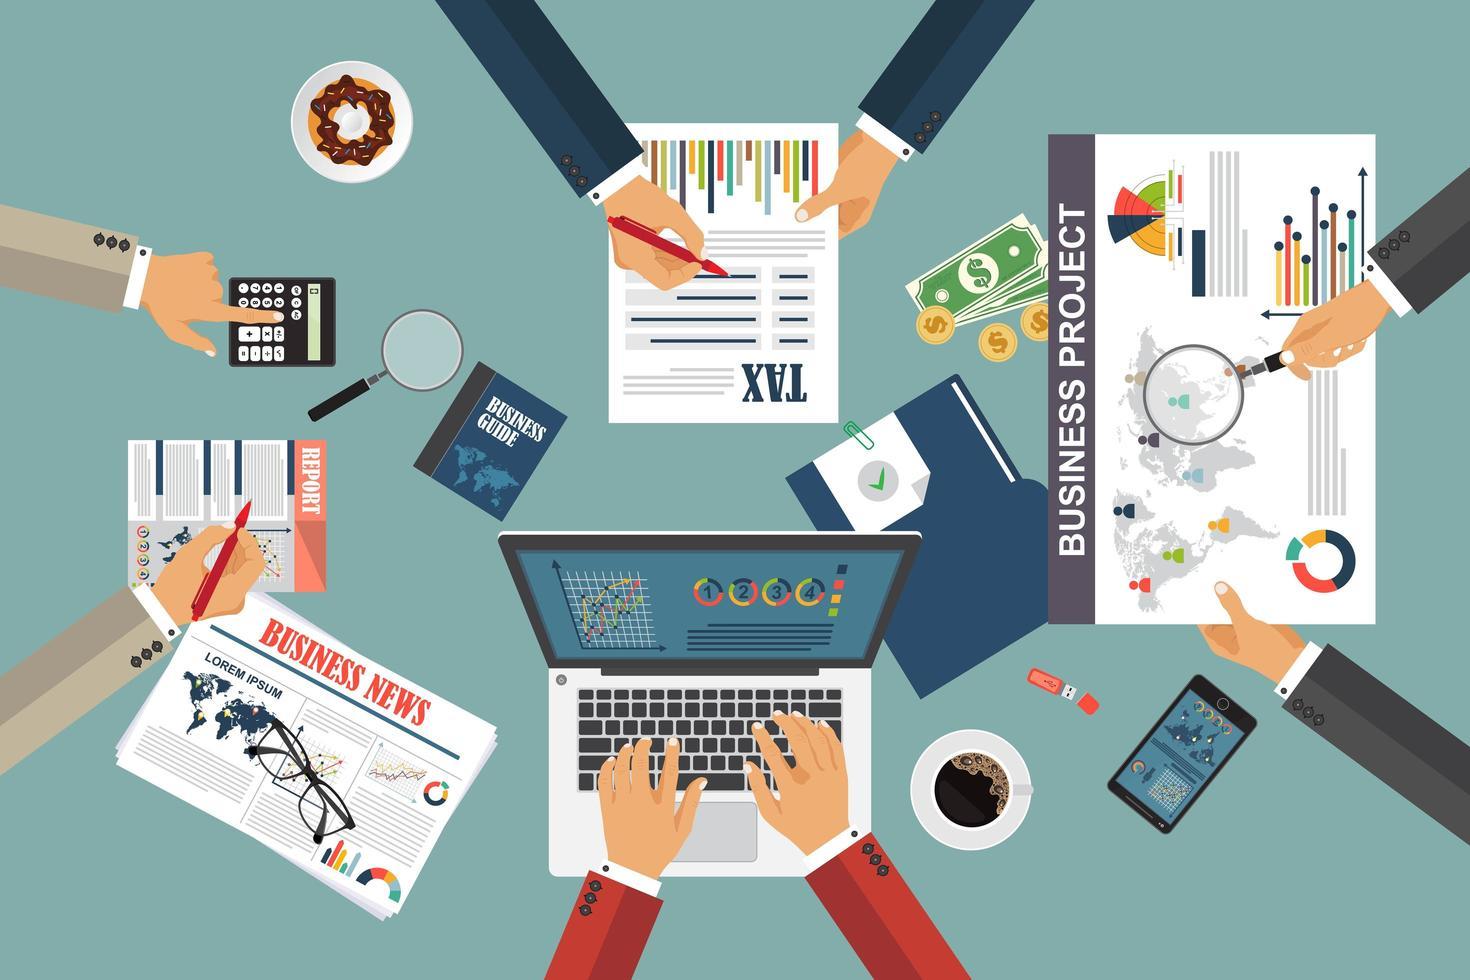 Fondo de concepto de auditoría con objetos de oficina vector